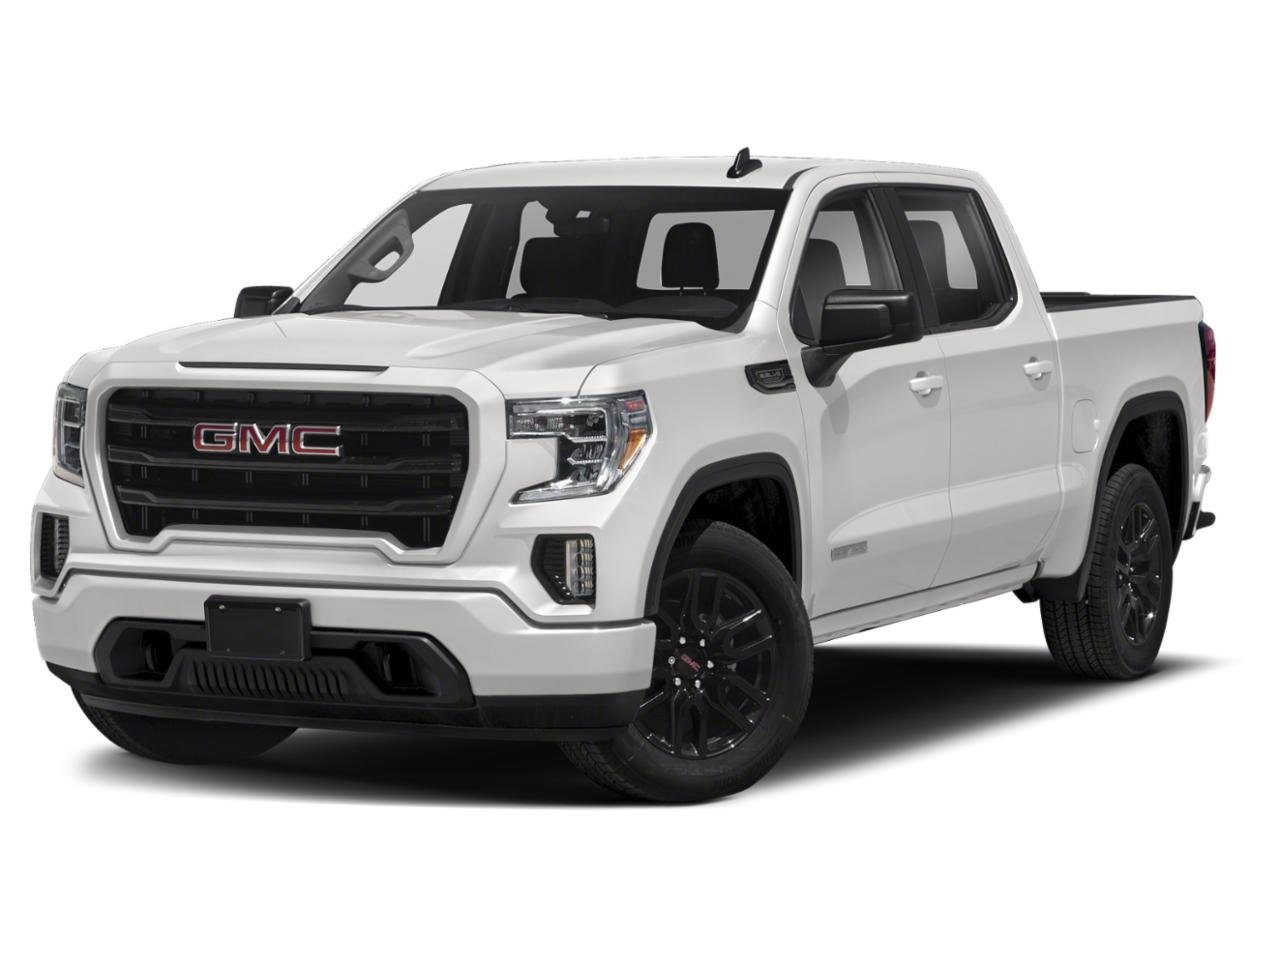 2021 GMC Sierra 1500 Vehicle Photo in DALLAS, TX 75209-3016